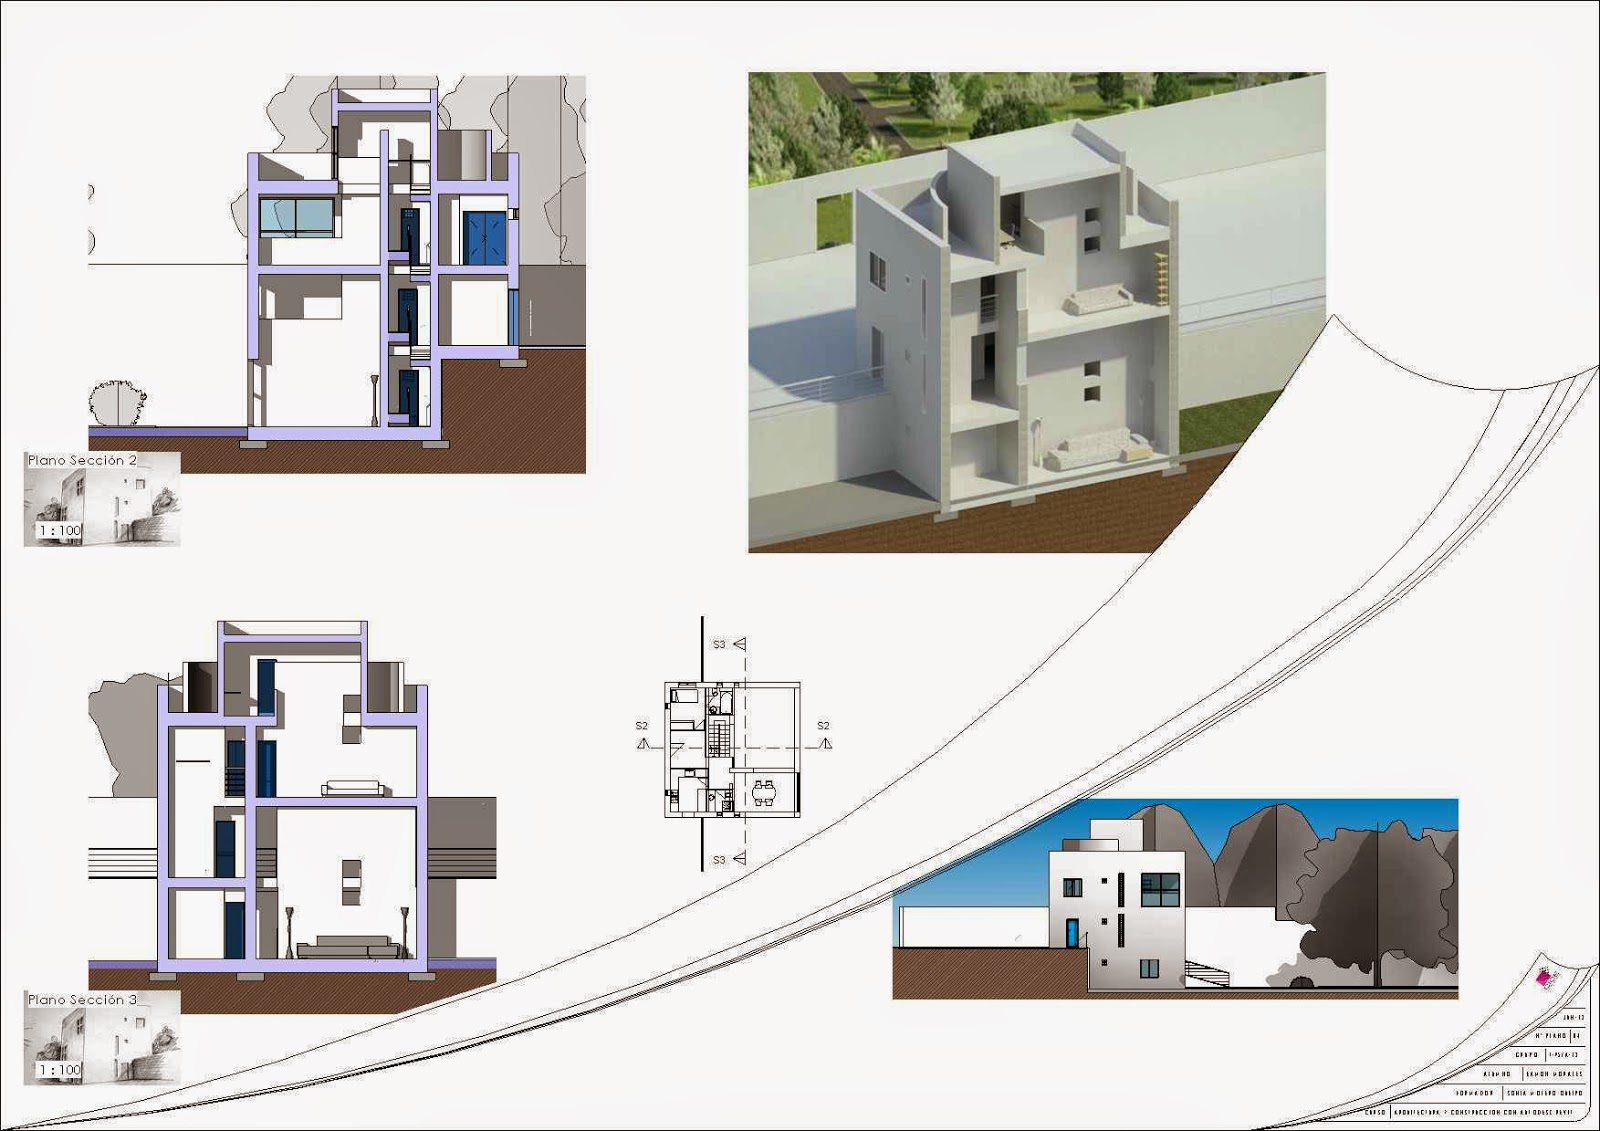 Revit practica turegano cice eamon morales for Pie de plano arquitectonico pdf